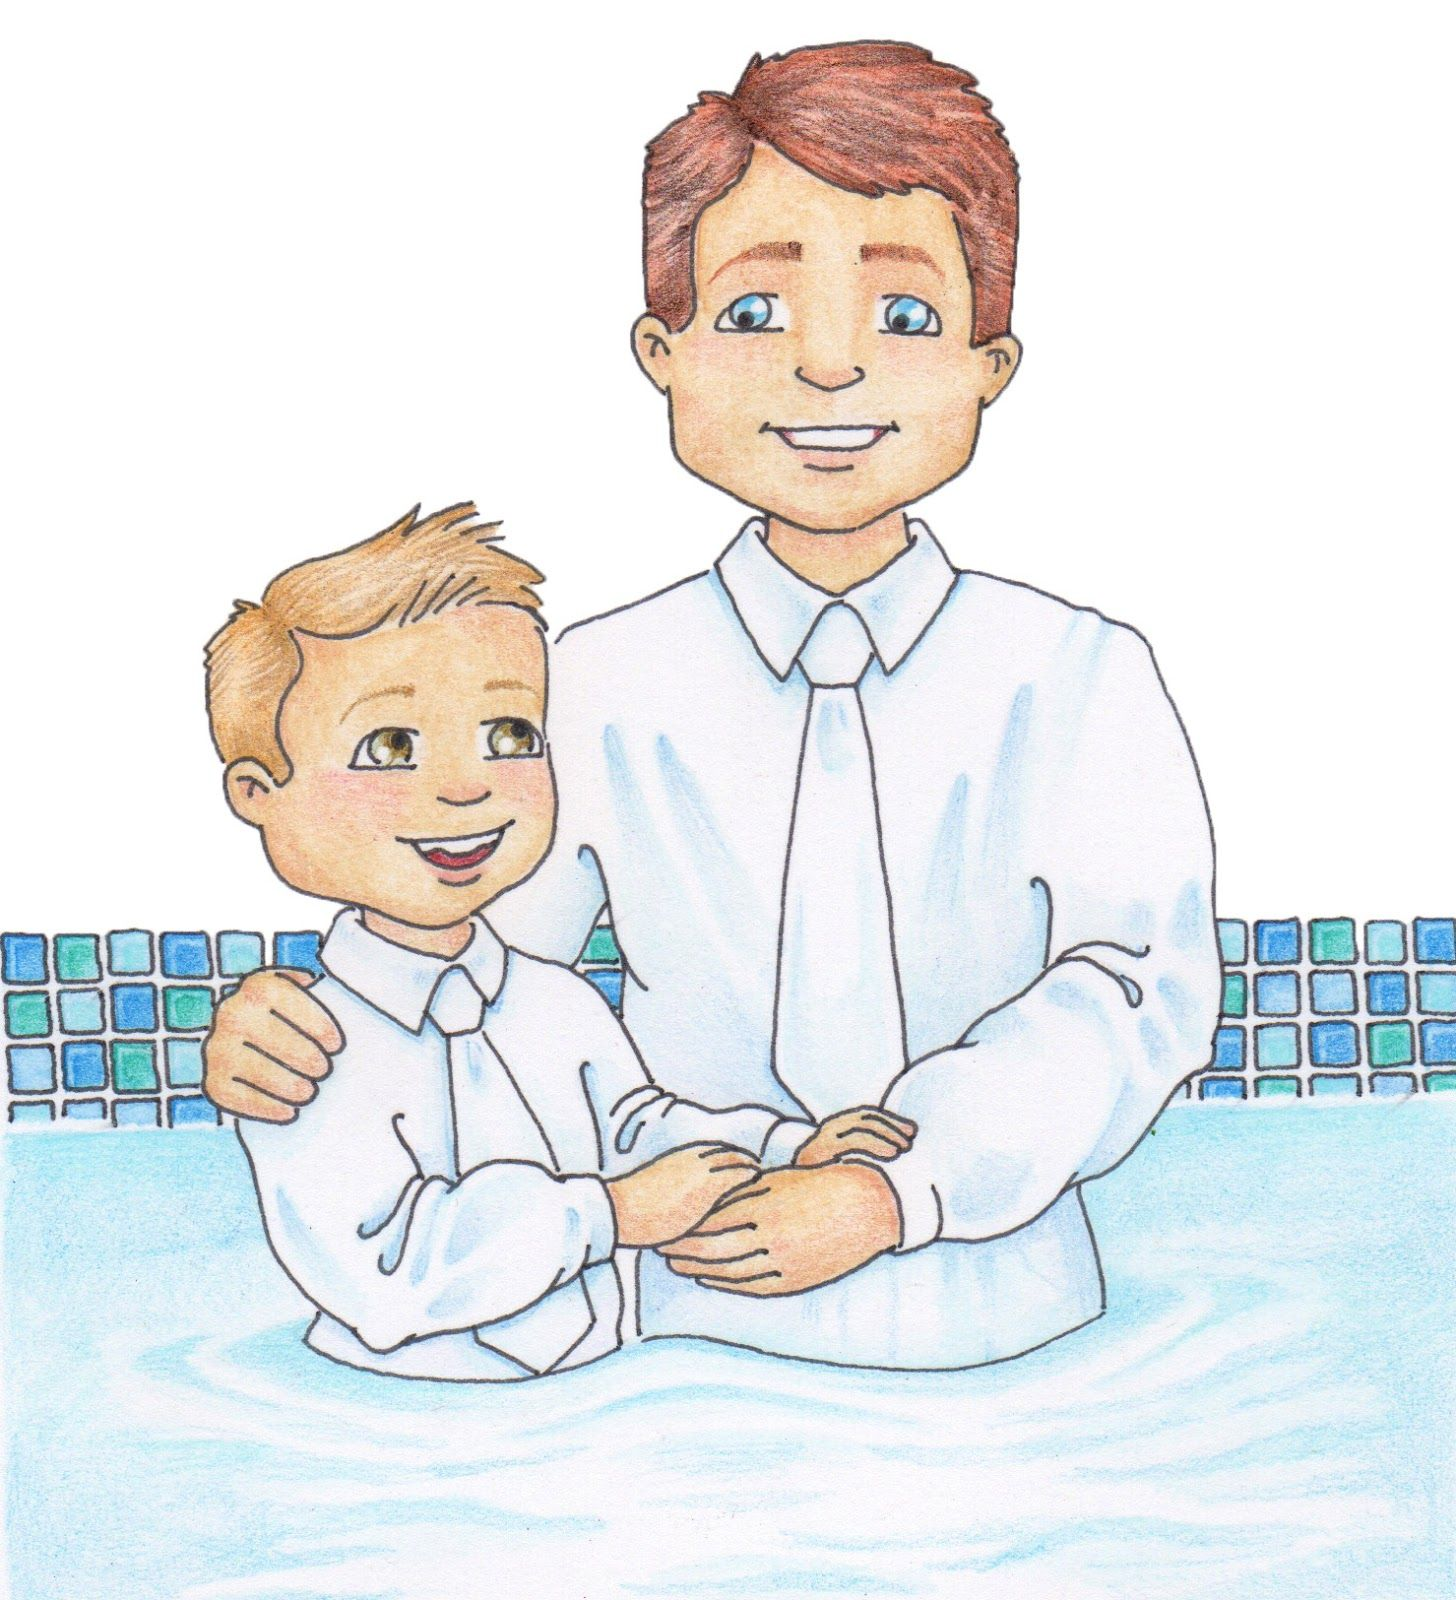 baptism jpeg 1 456 1 600 pixels church teaching helps activity rh pinterest com lds baptism clipart free LDS Baptism Program